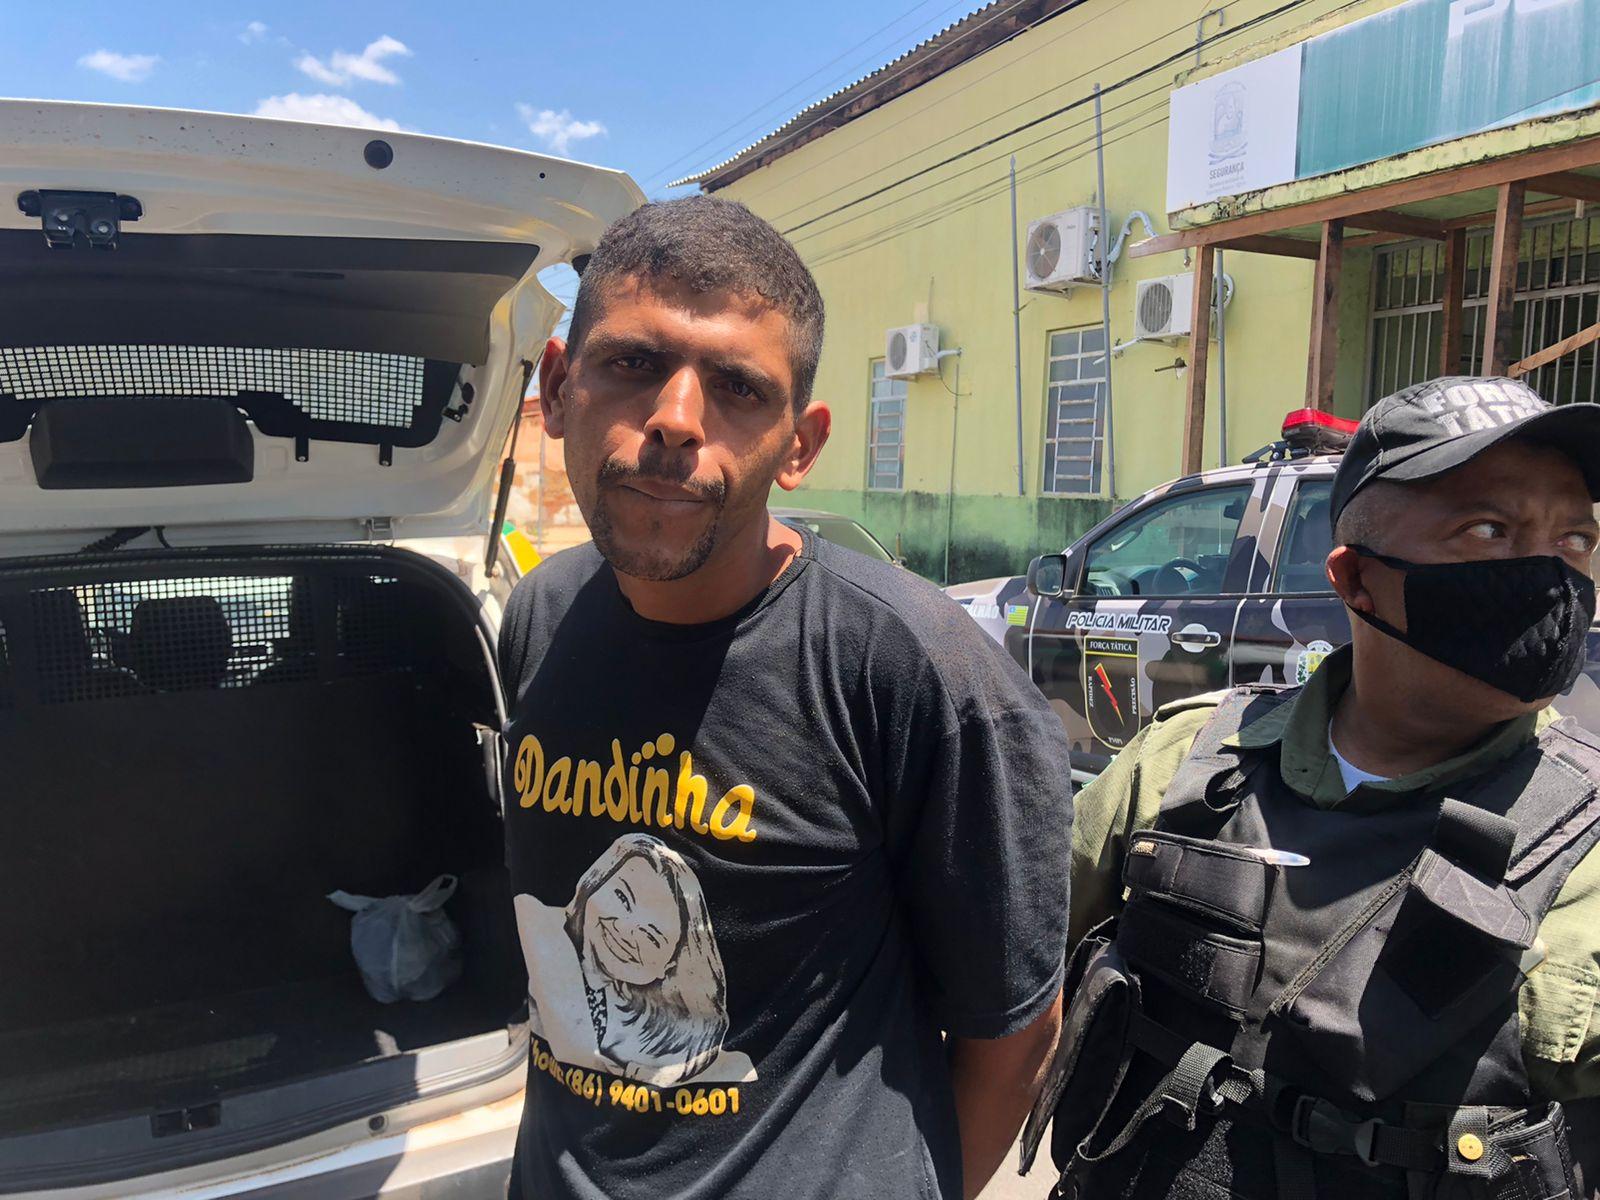 Suspeito de matar Janiel da Silva foi preso horas depois do crime em Teresina - Foto: Portal MN